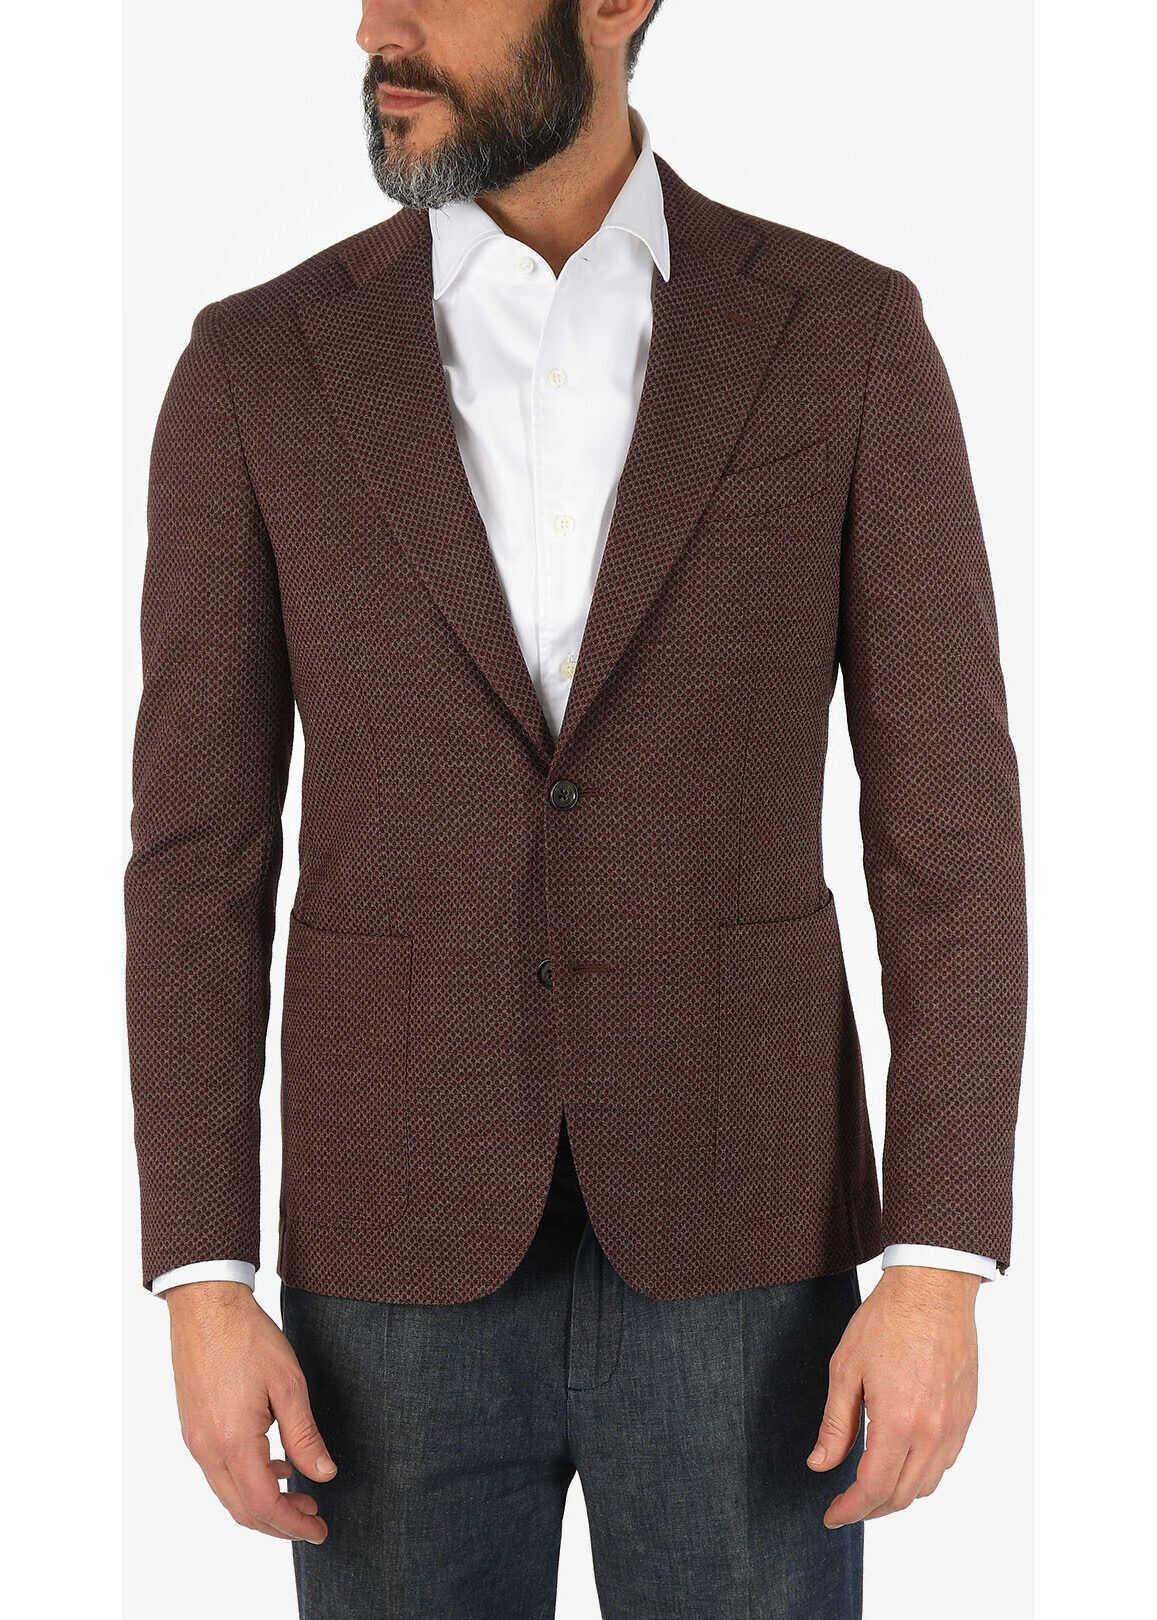 CORNELIANI CC COLLECTION virgin wool REWARD blazer BURGUNDY imagine